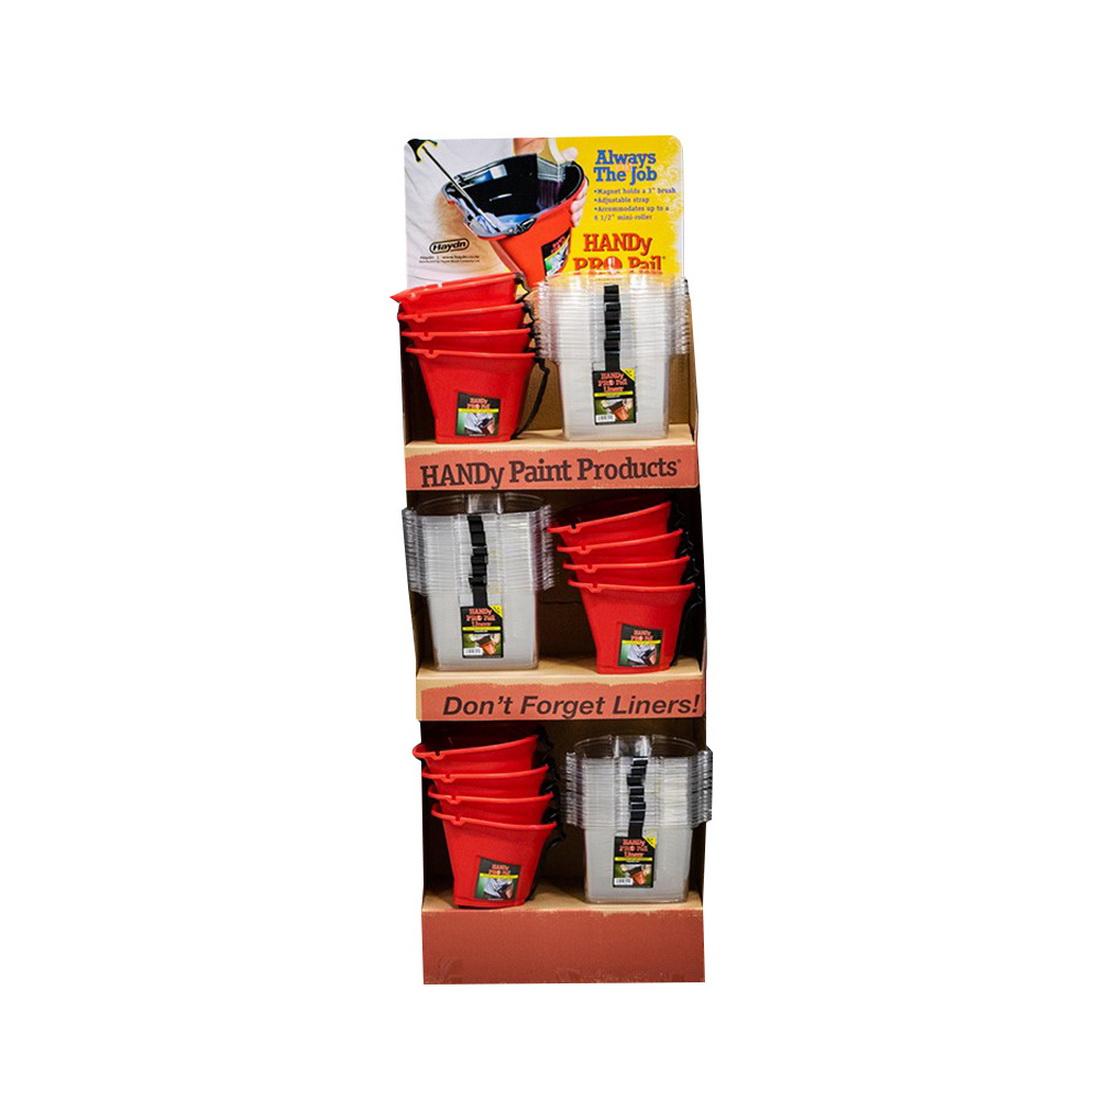 Handy Pro Pail Bucket & Liner Display Unit